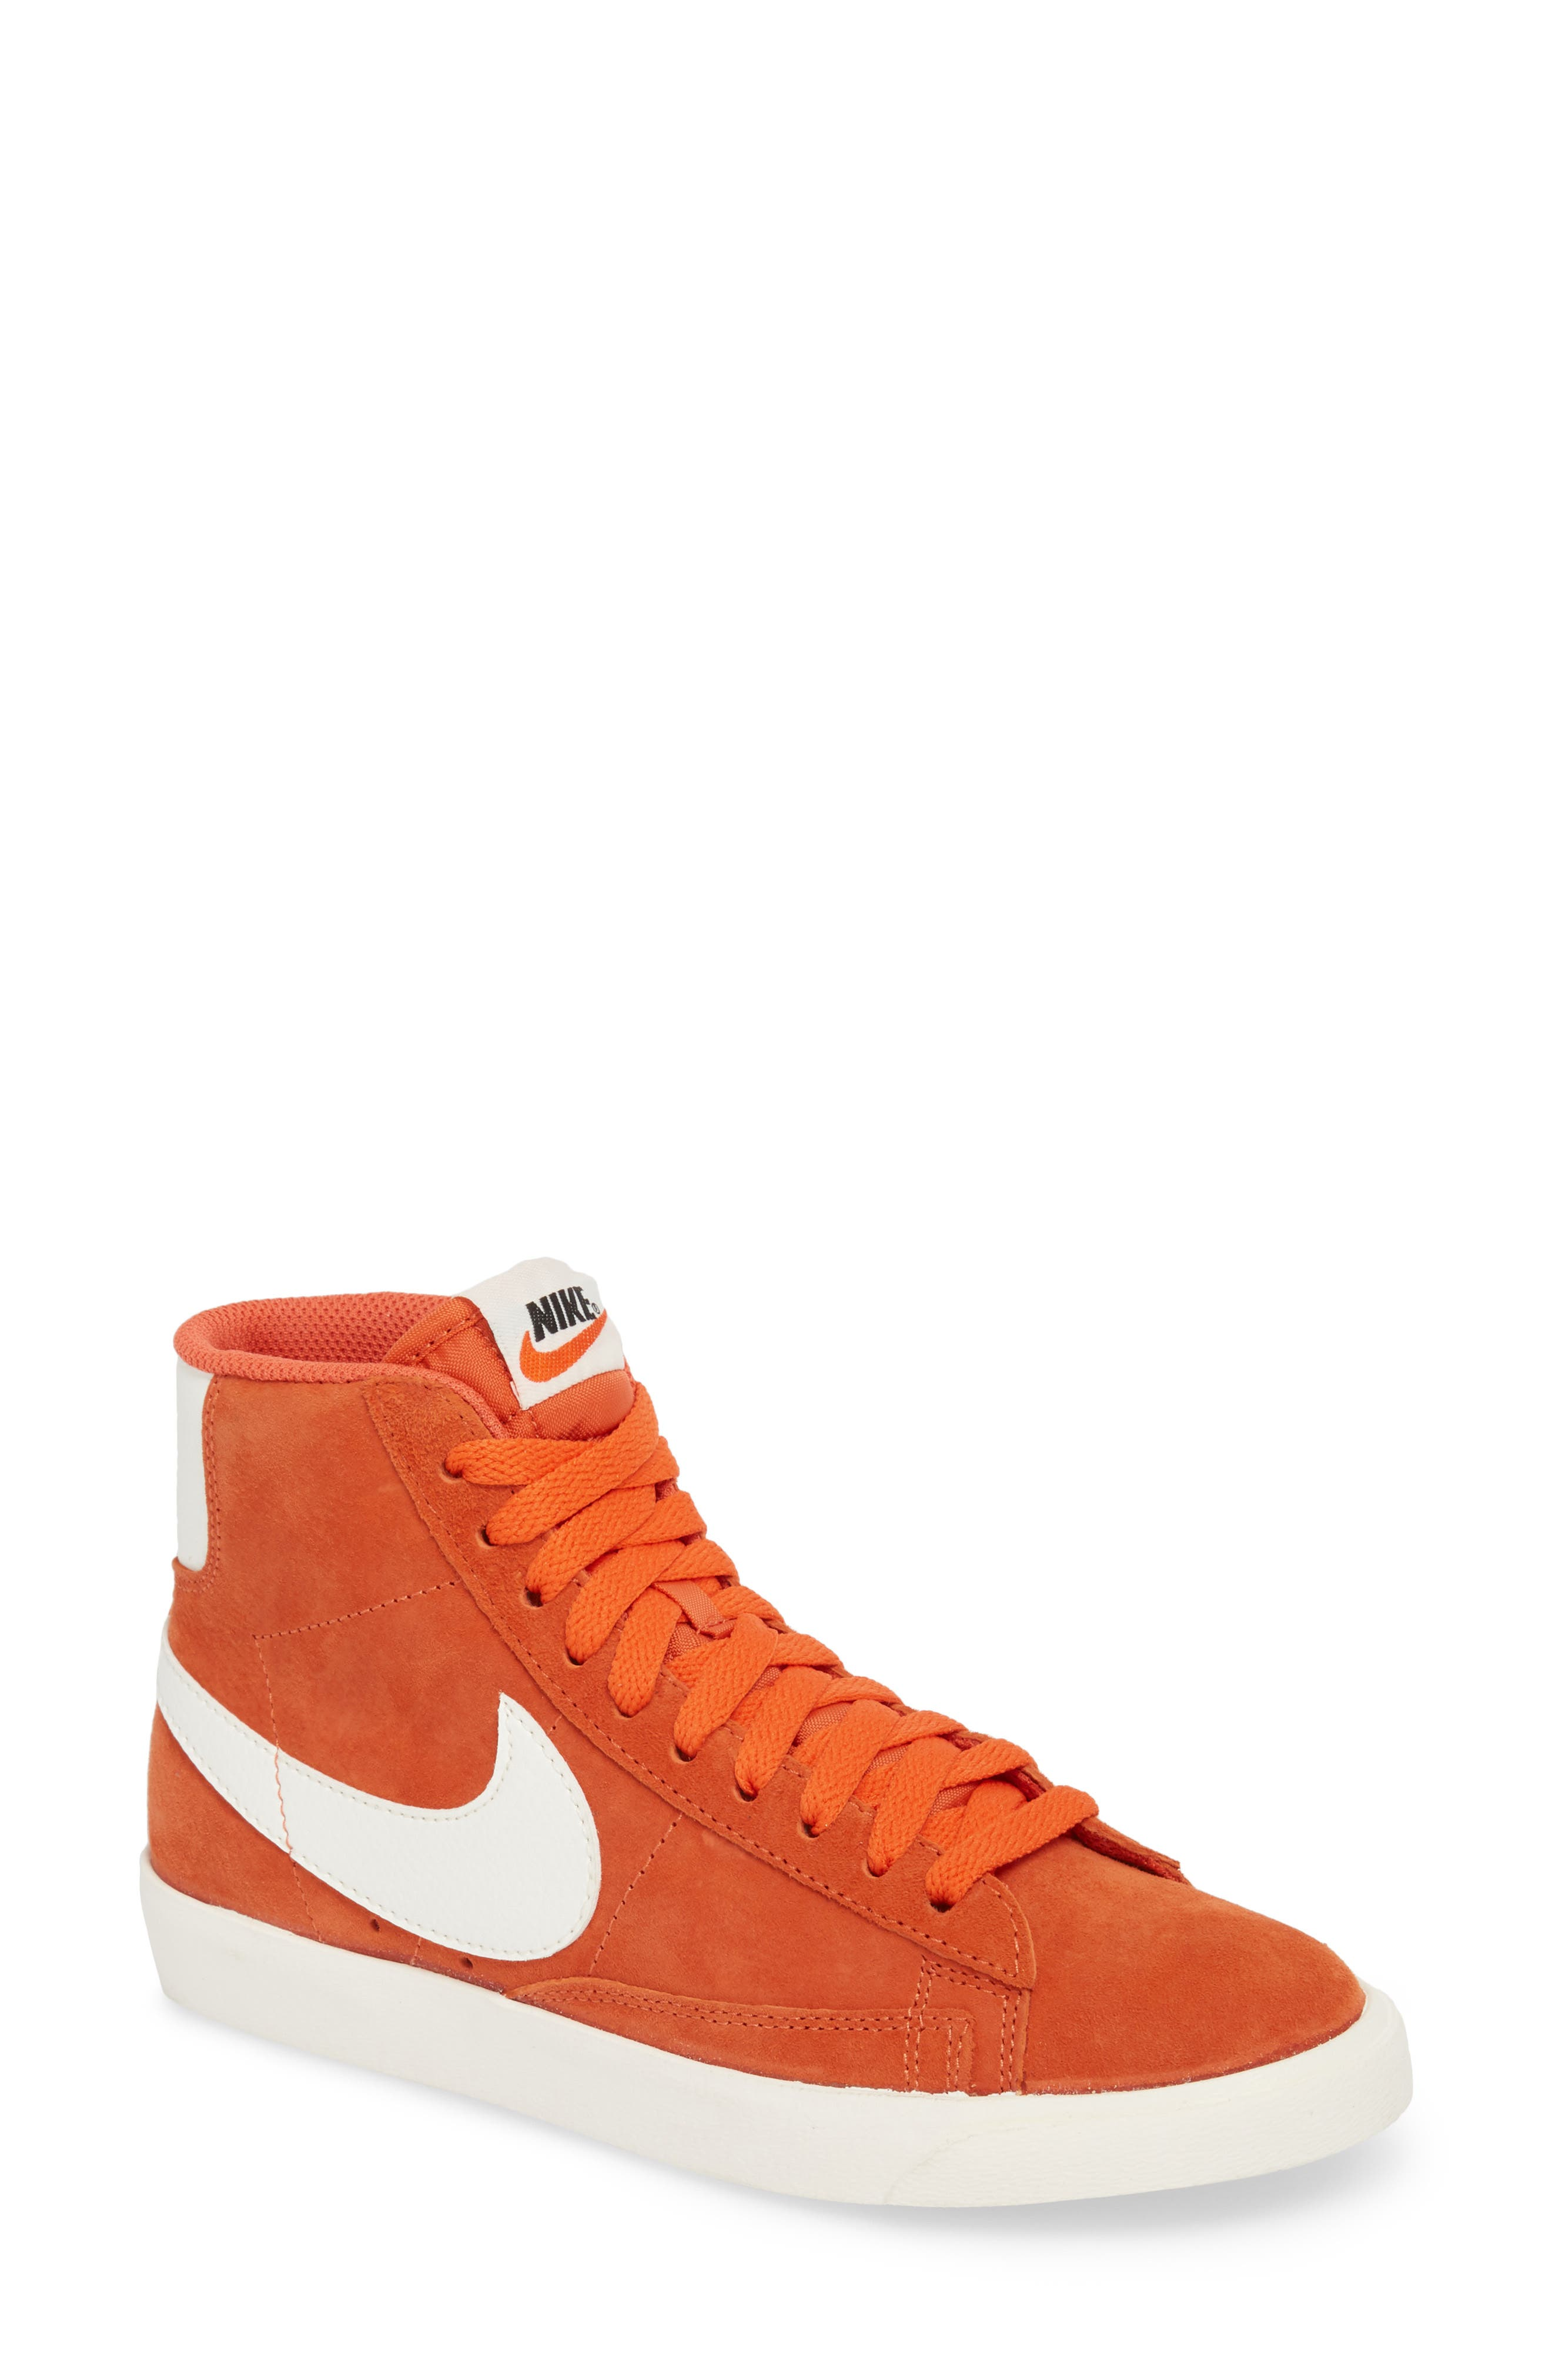 Main Image - Nike Blazer Mid Vintage Sneakers (Women)